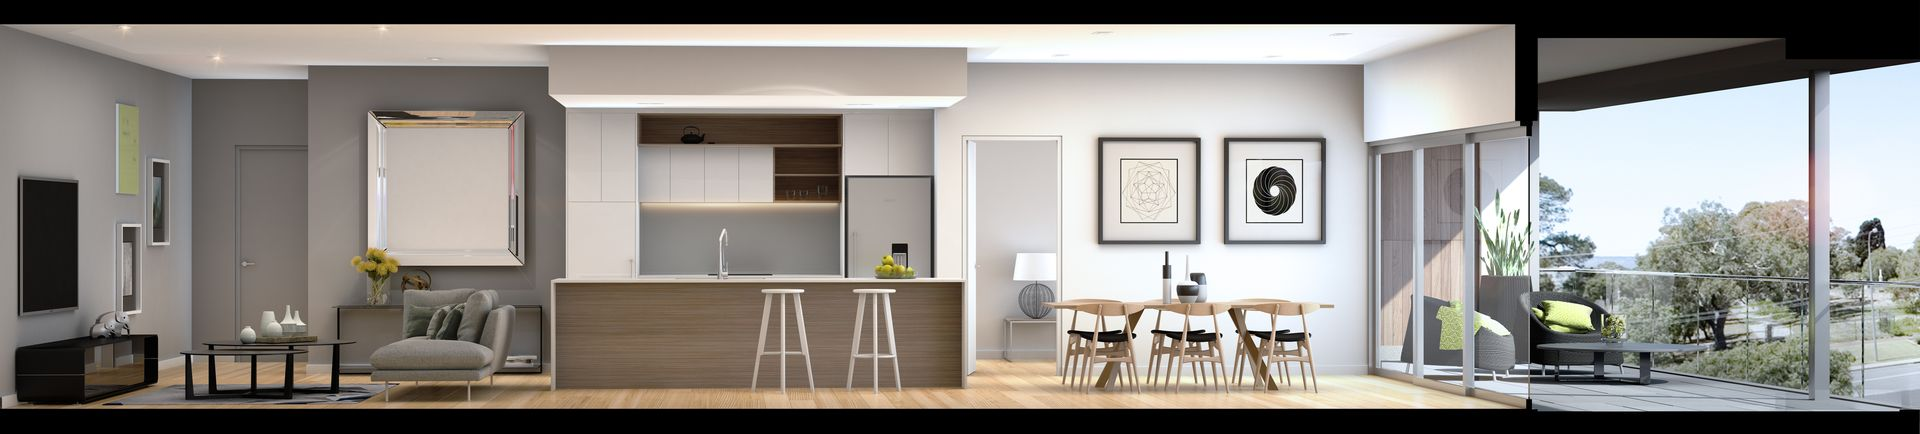 Level 1, 2/16 Wickham Street, East Perth WA 6004, Image 1